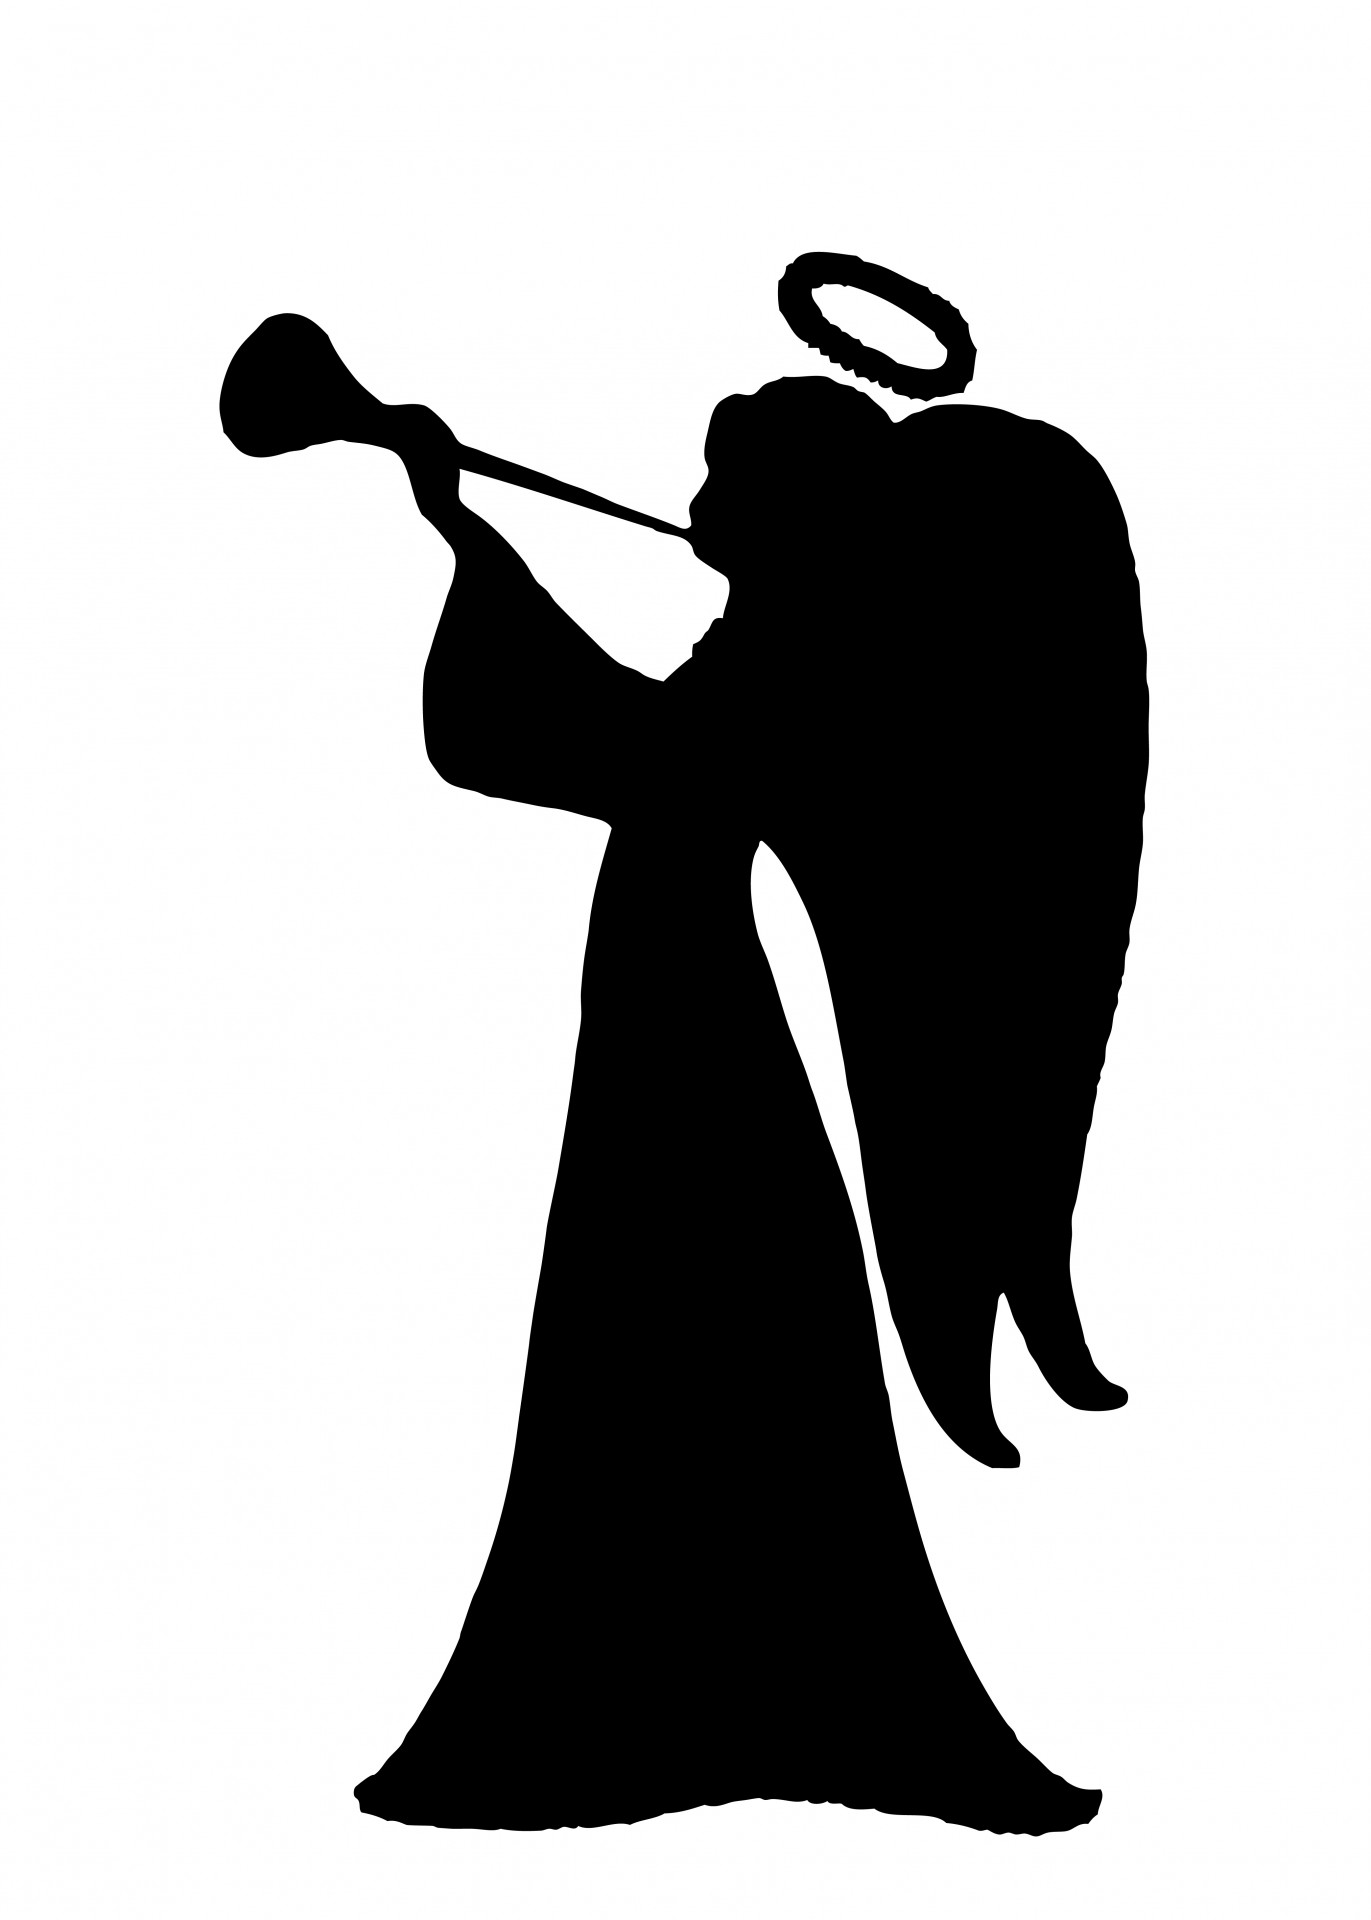 Angel silhouette clip art free.